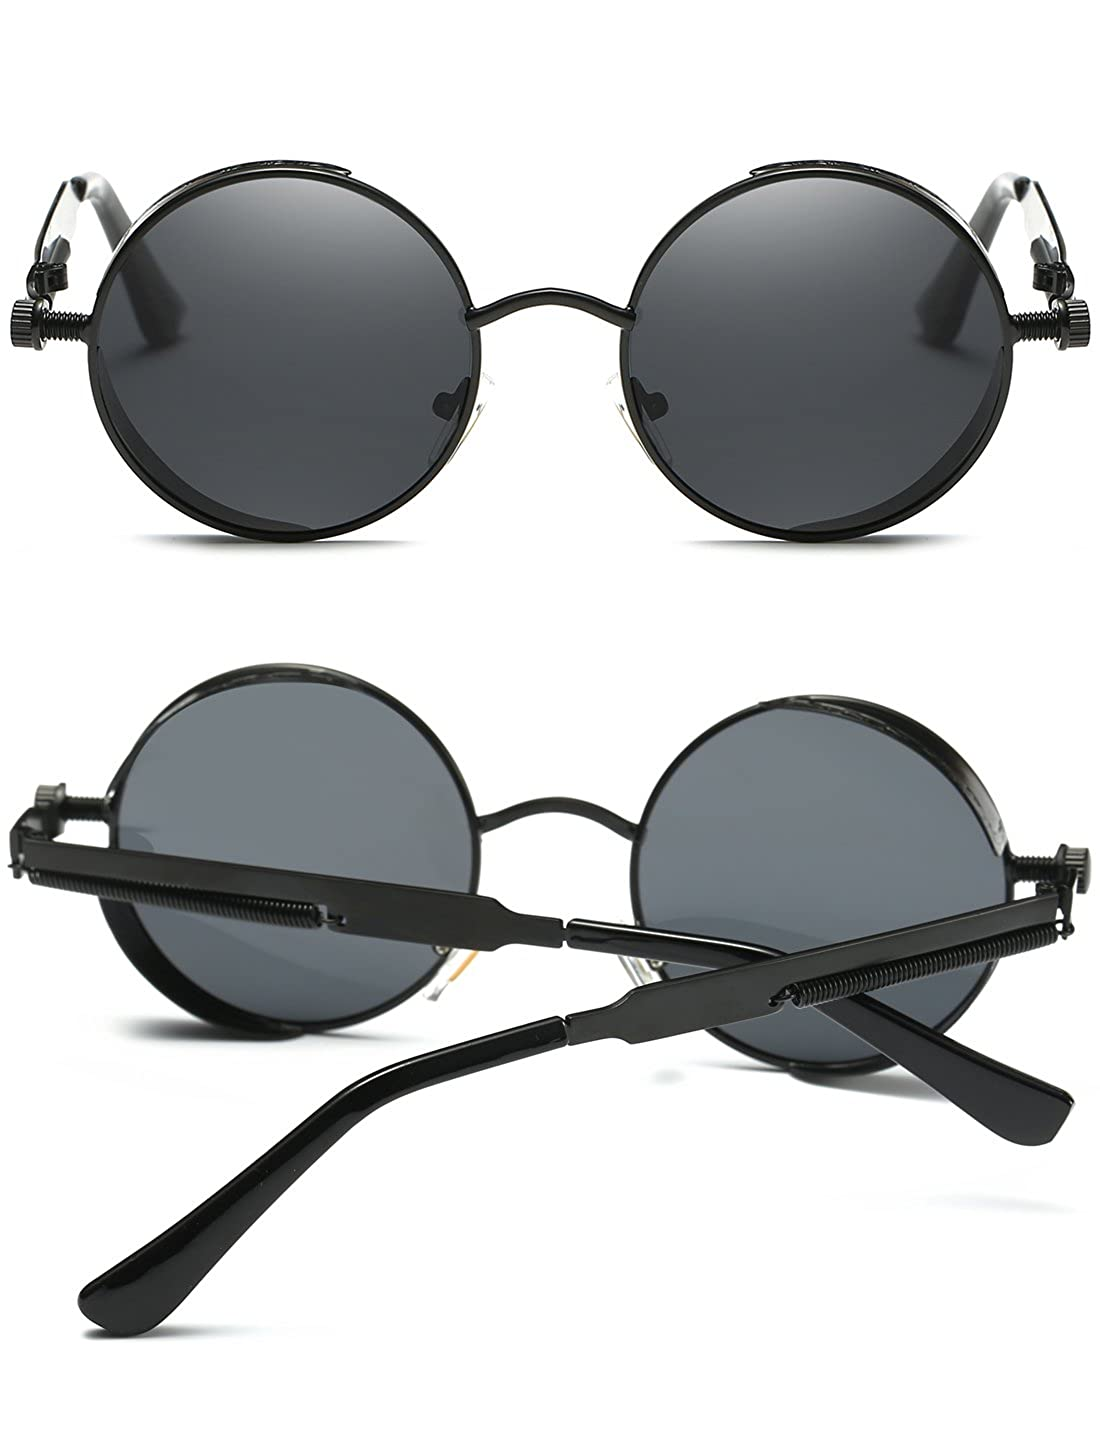 d537f1ef35 Joopin-Round Retro Polaroid Sunglasses Driving Polarized Glasses Men  Steampunk